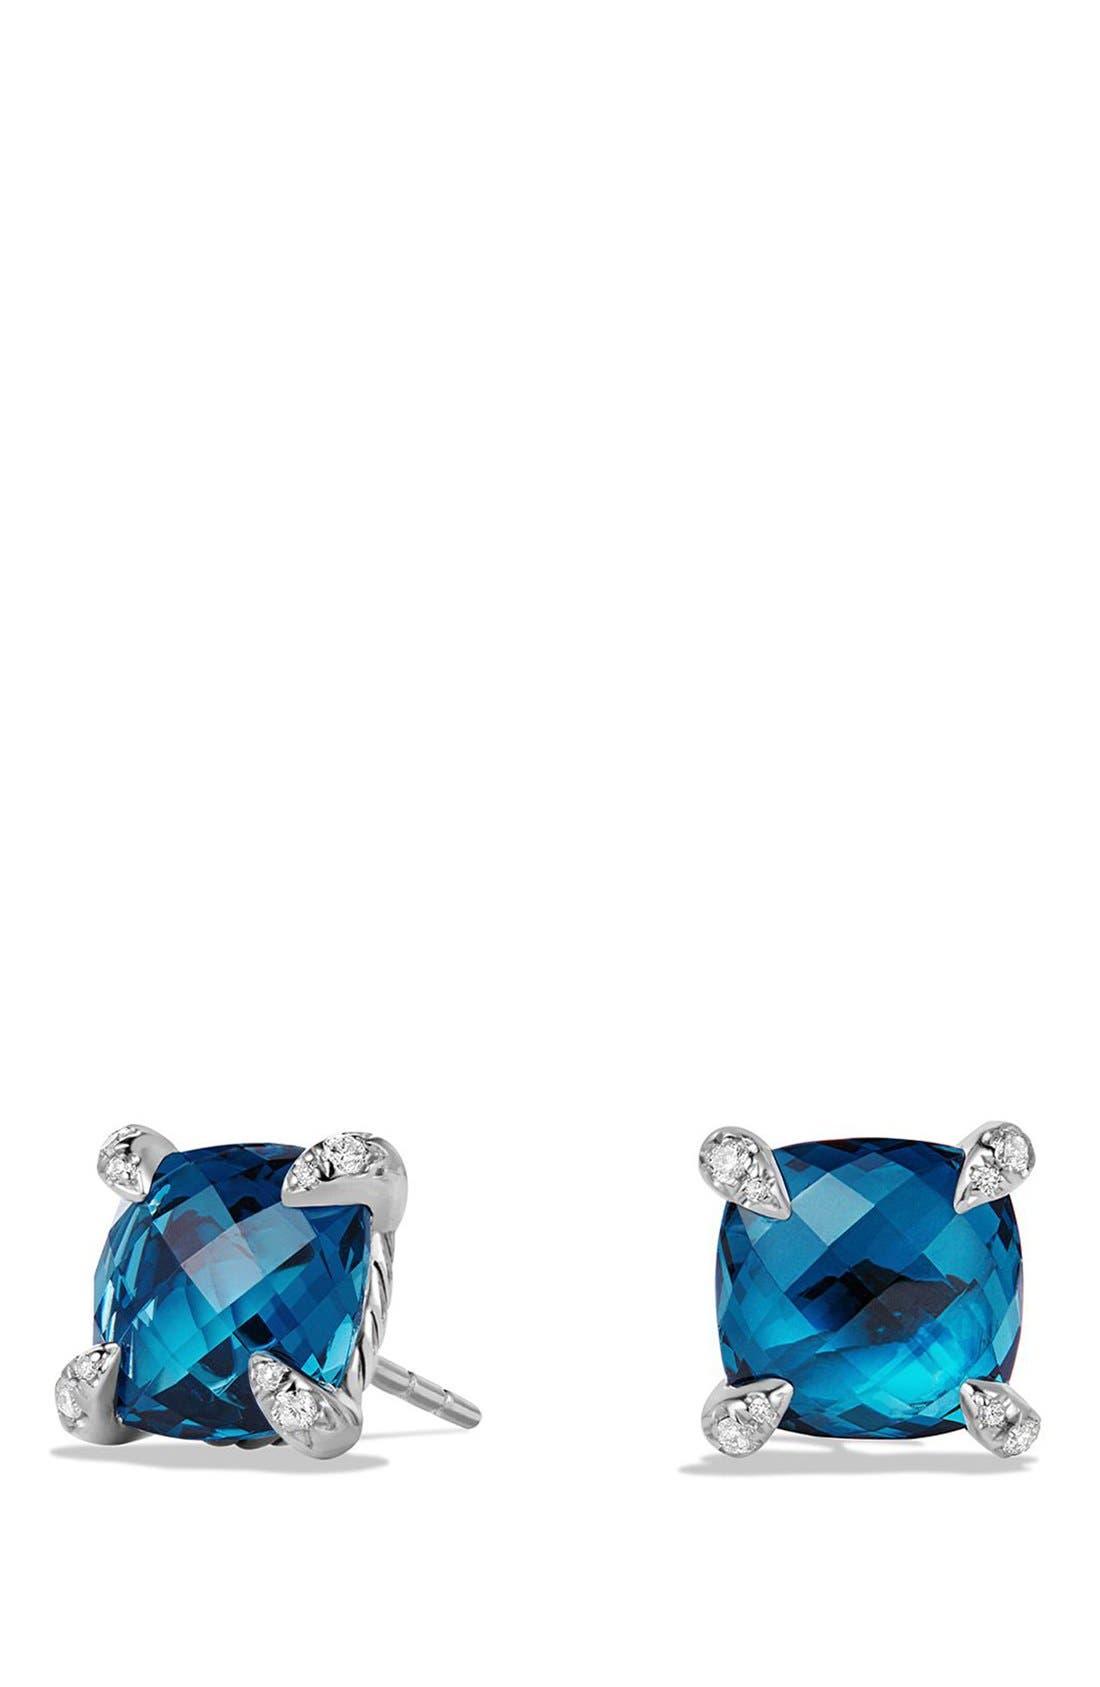 DAVID YURMAN 'Châtelaine' Earrings with Semiprecious Stones and Diamonds, Main, color, SILVER/ HAMPTON BLUE TOPAZ